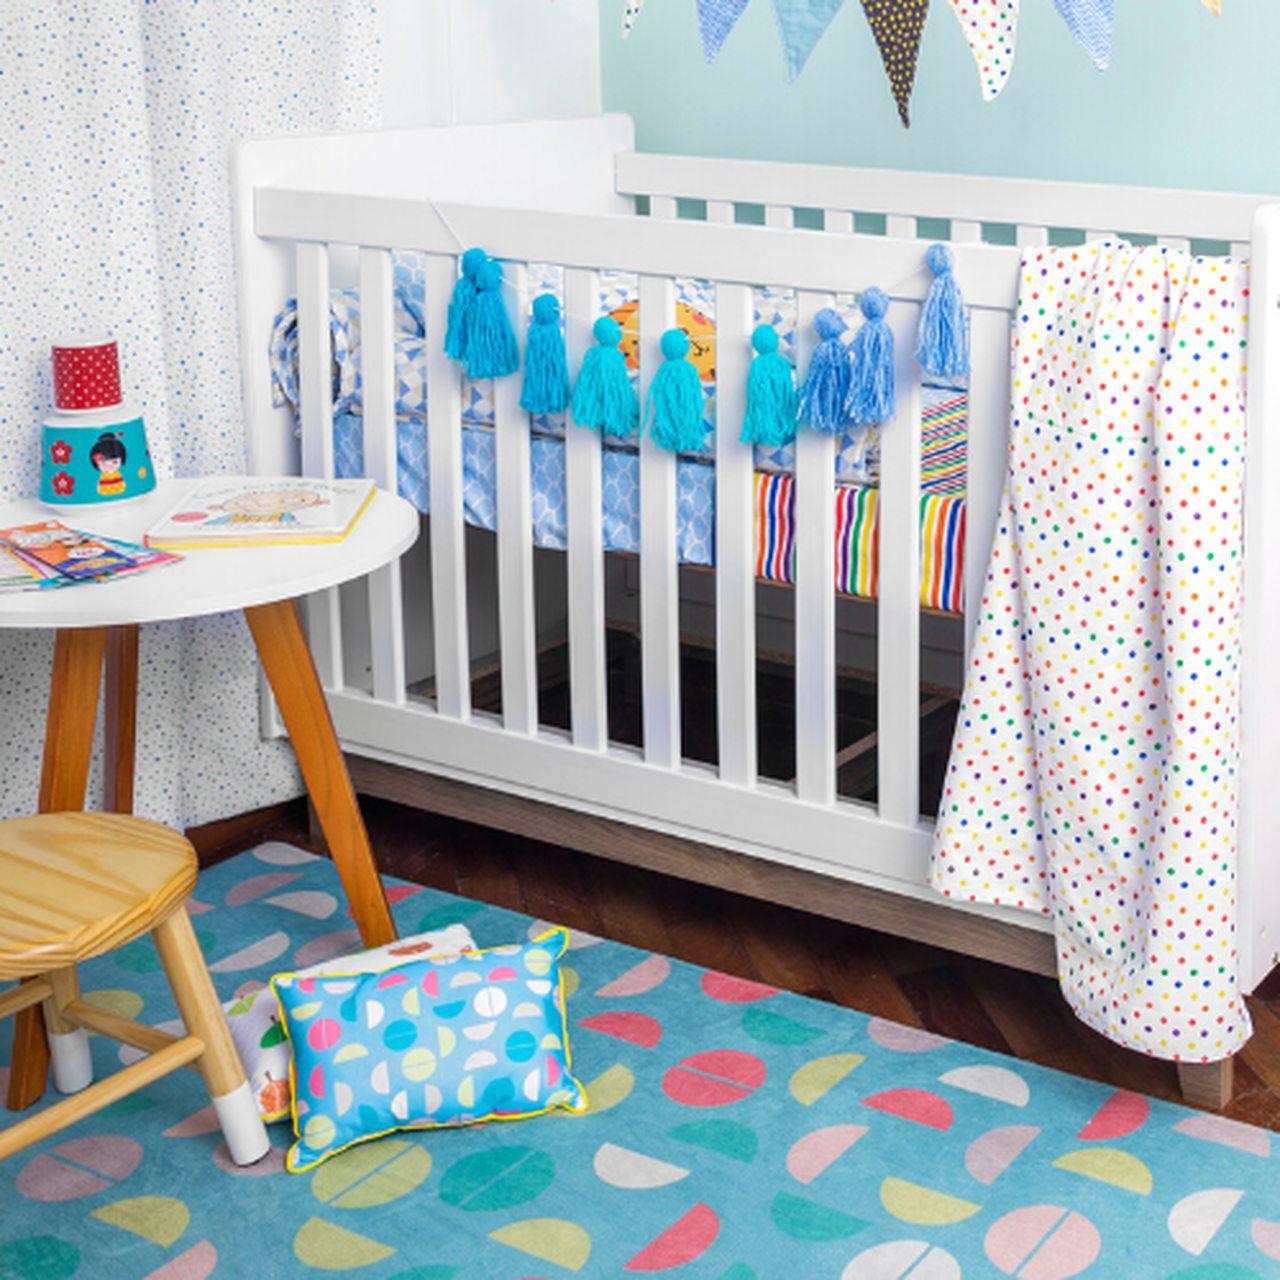 Tapete quarto infantil 100 x 150 cm estampa Colorball Azul  - Pomelo Decor